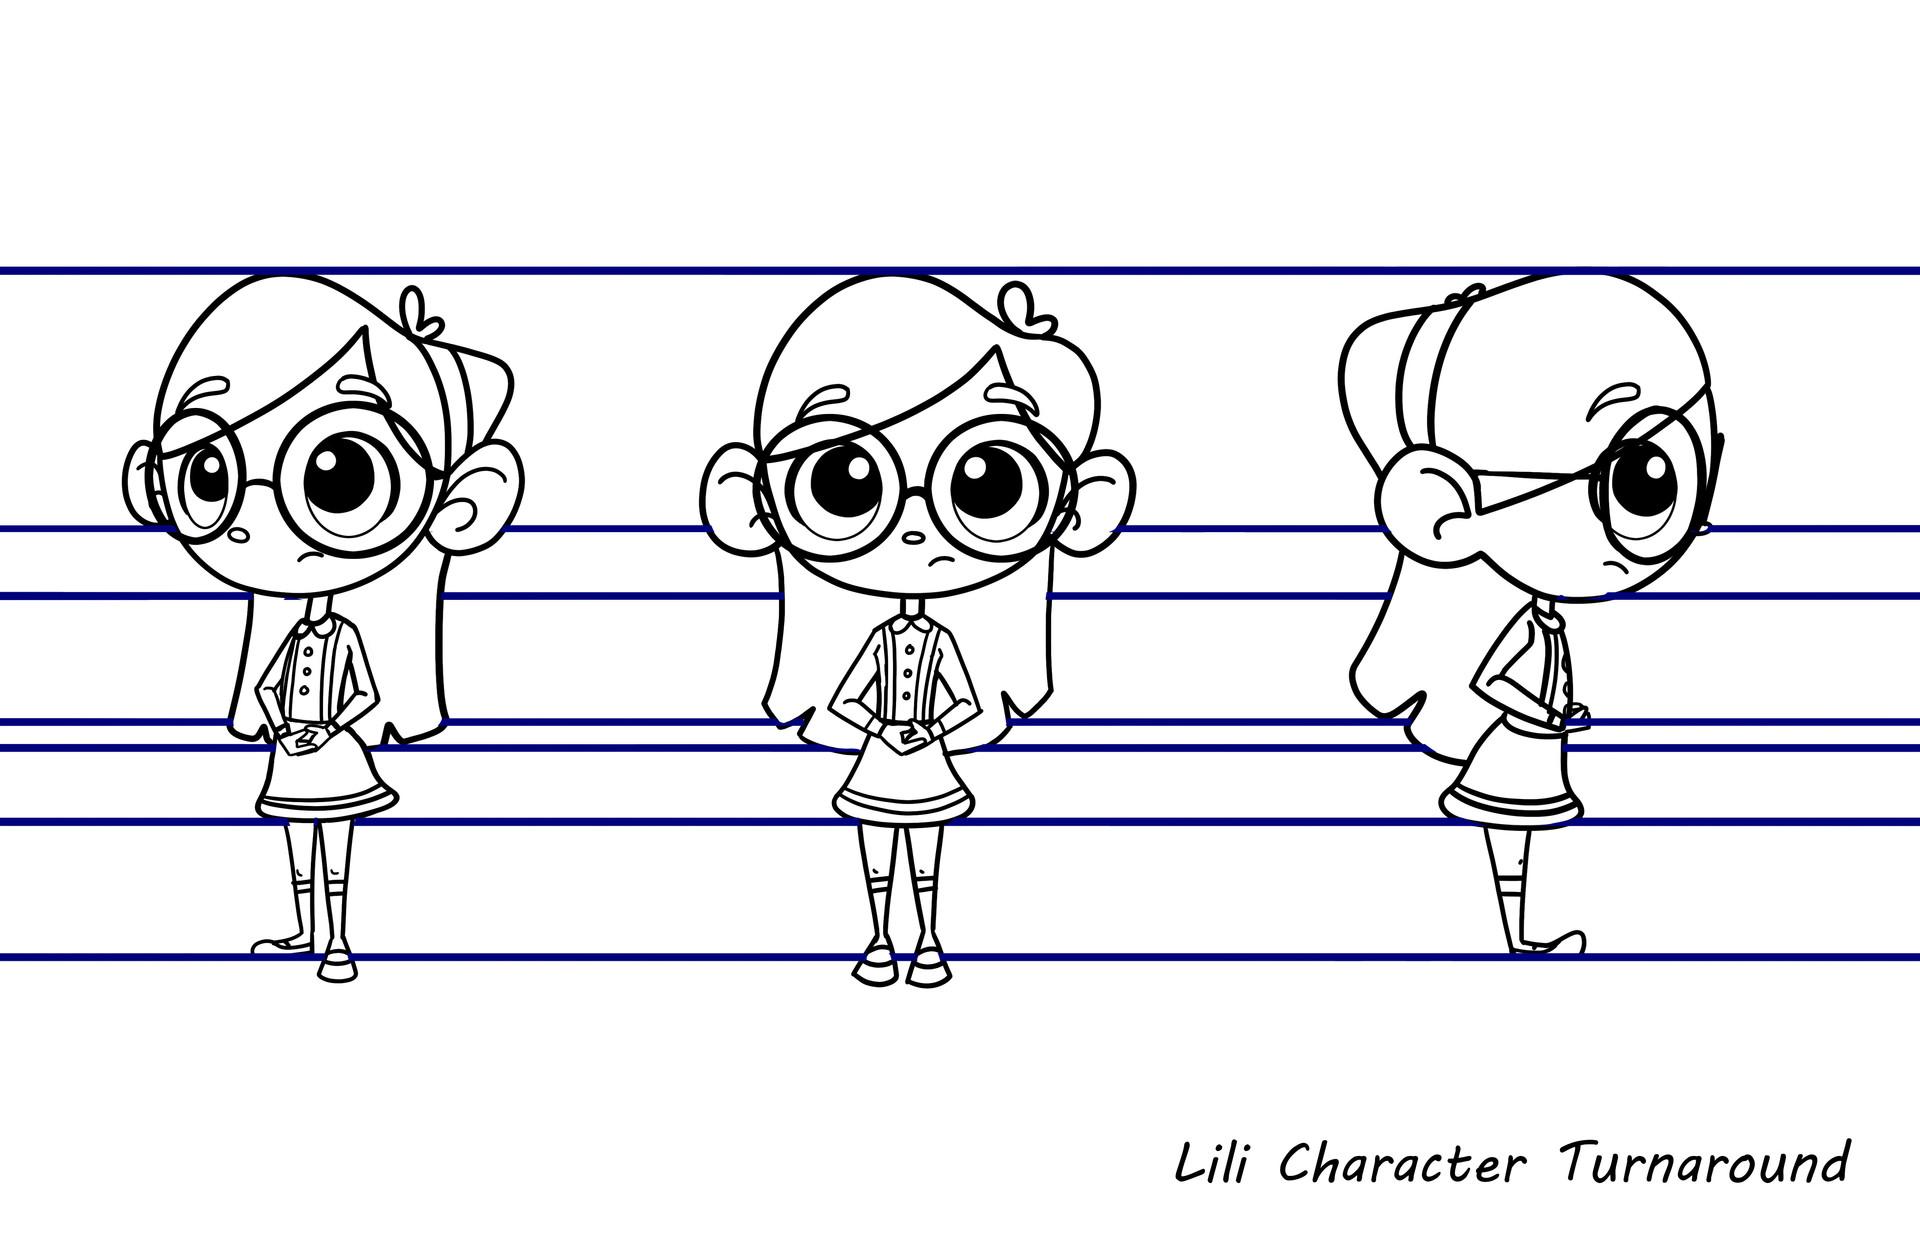 Character designs_Lili.jpg